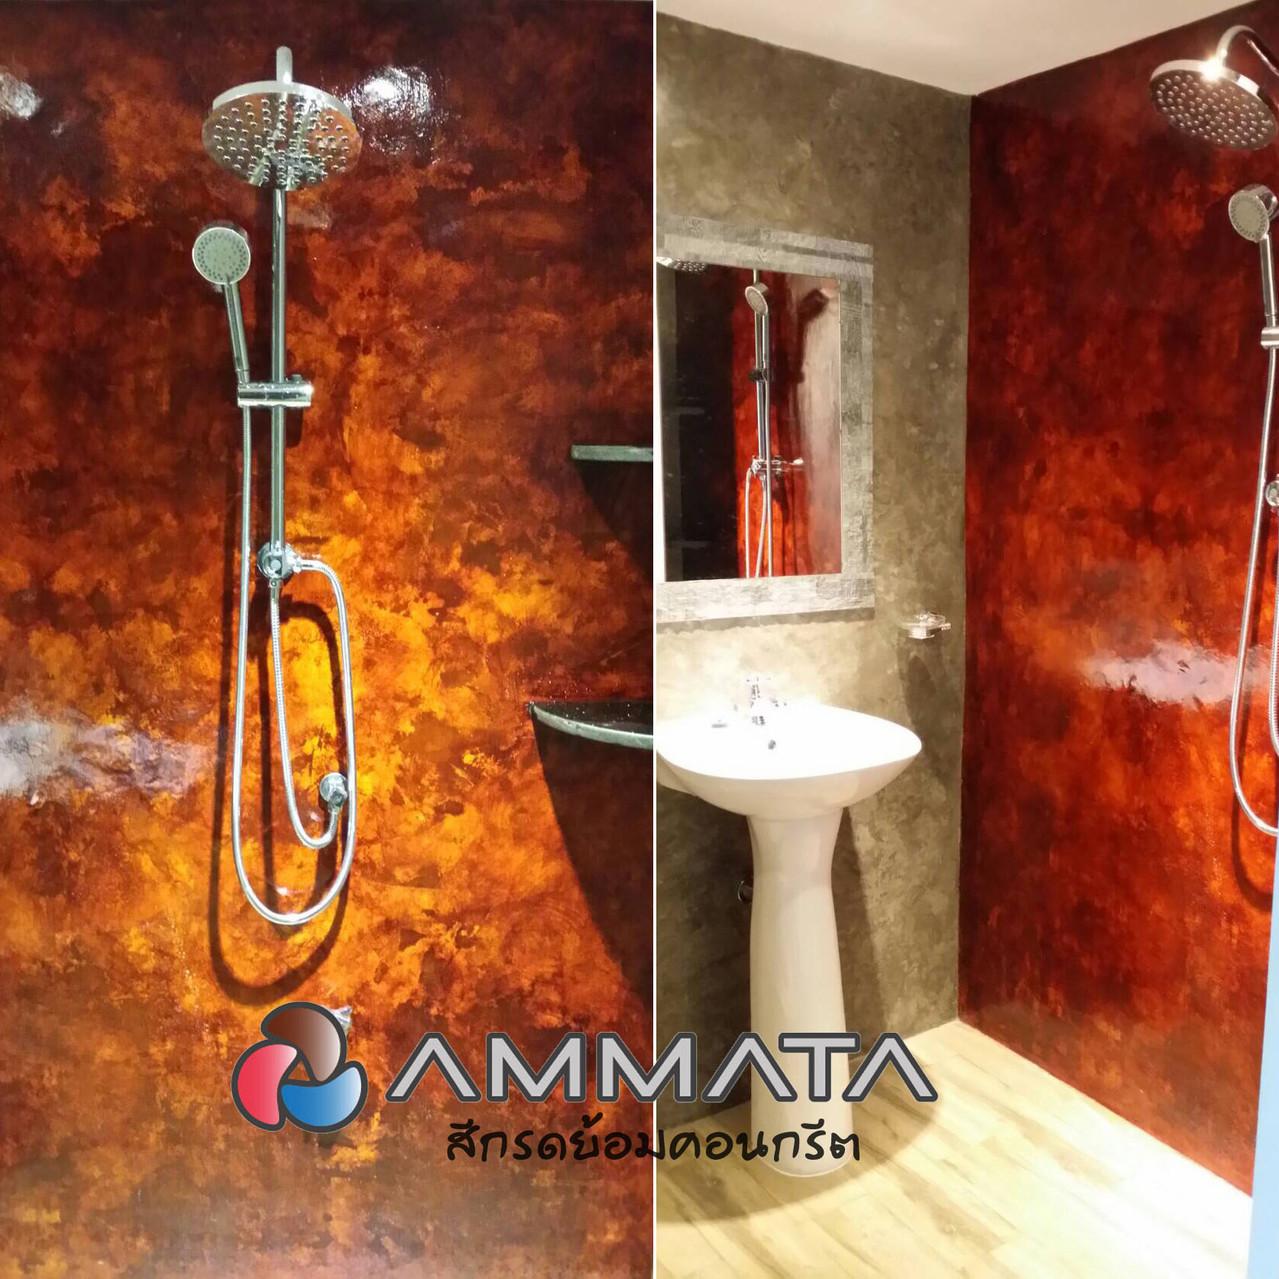 Ammata - สีกรดย้อมคอนกรีต (14)